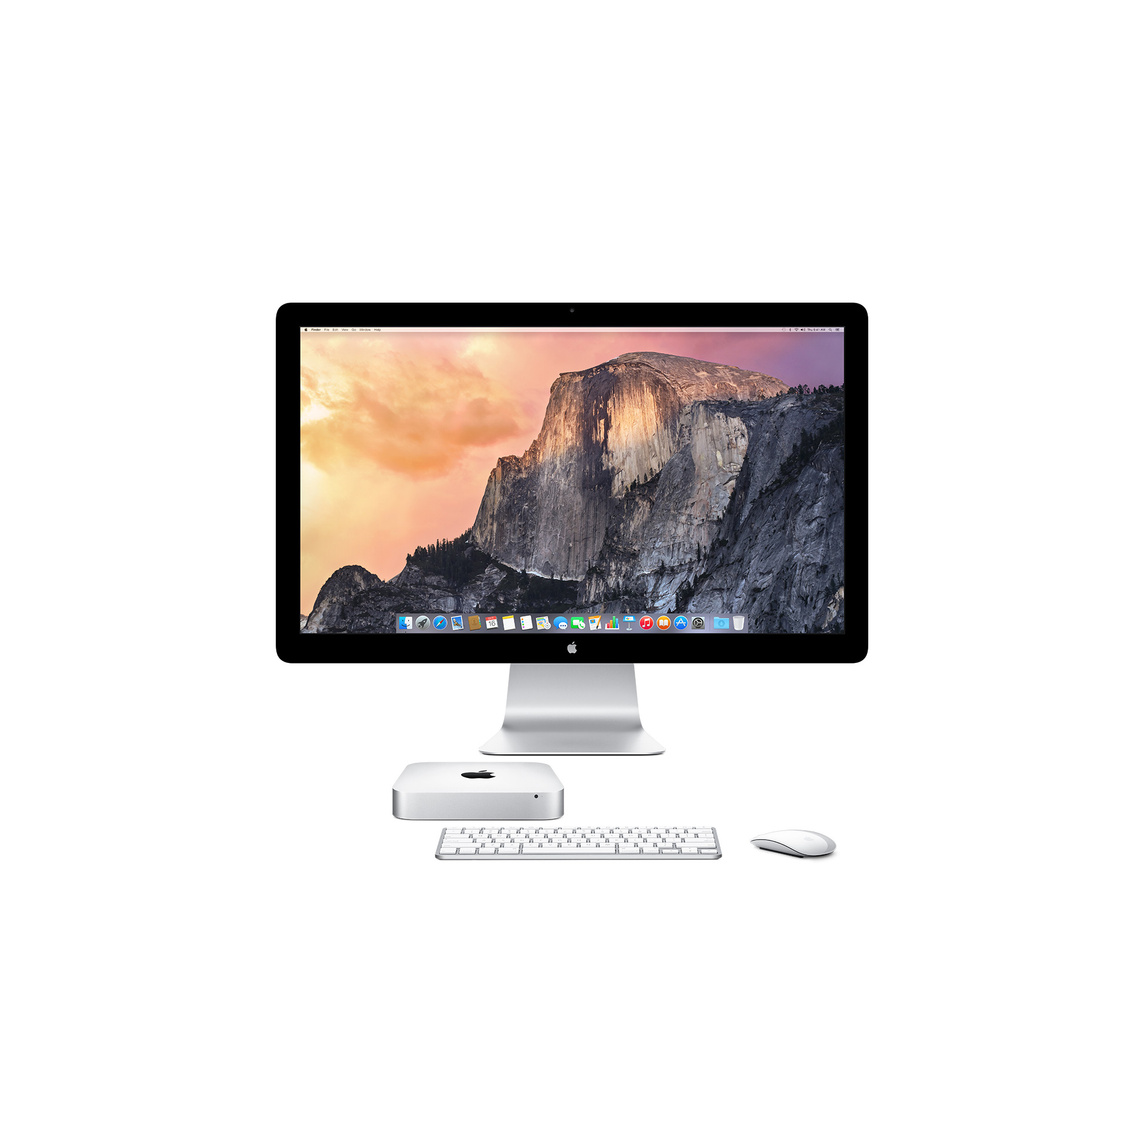 Refurbished Mac Mini 3 0GHz Dual-core Intel Core i7